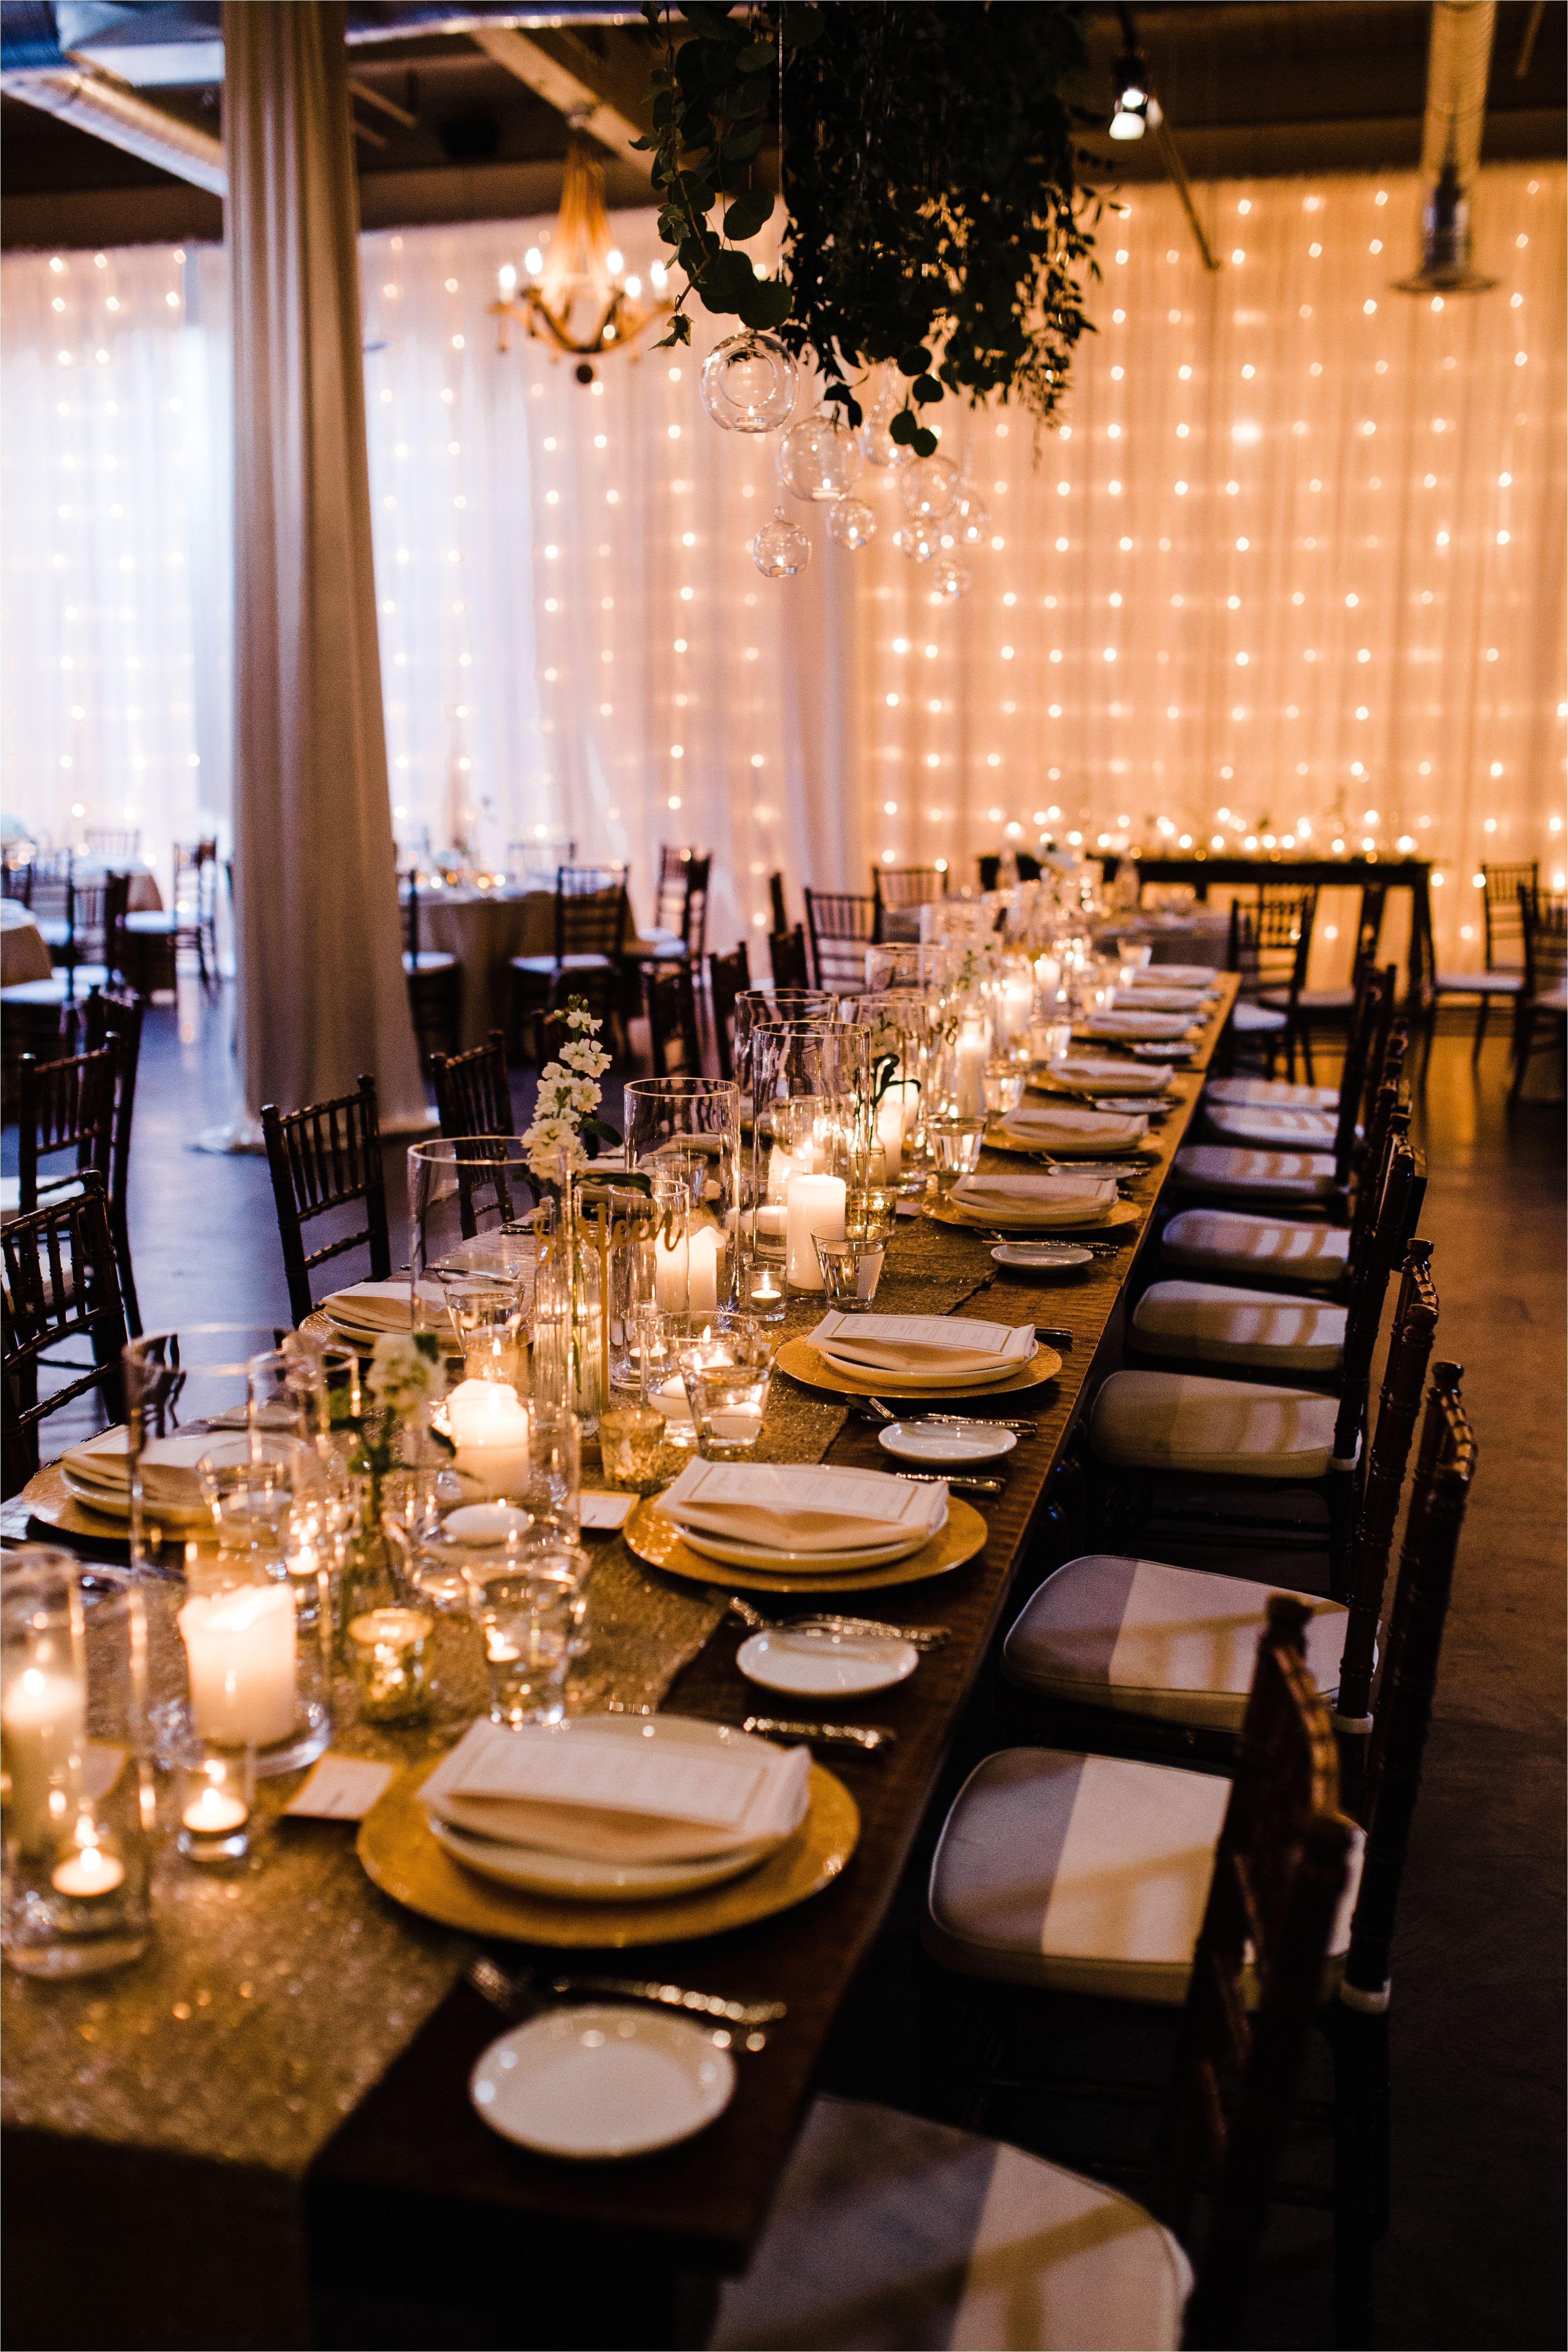 silva wedding head table decor hanging greenery and floral by herban bloom custom